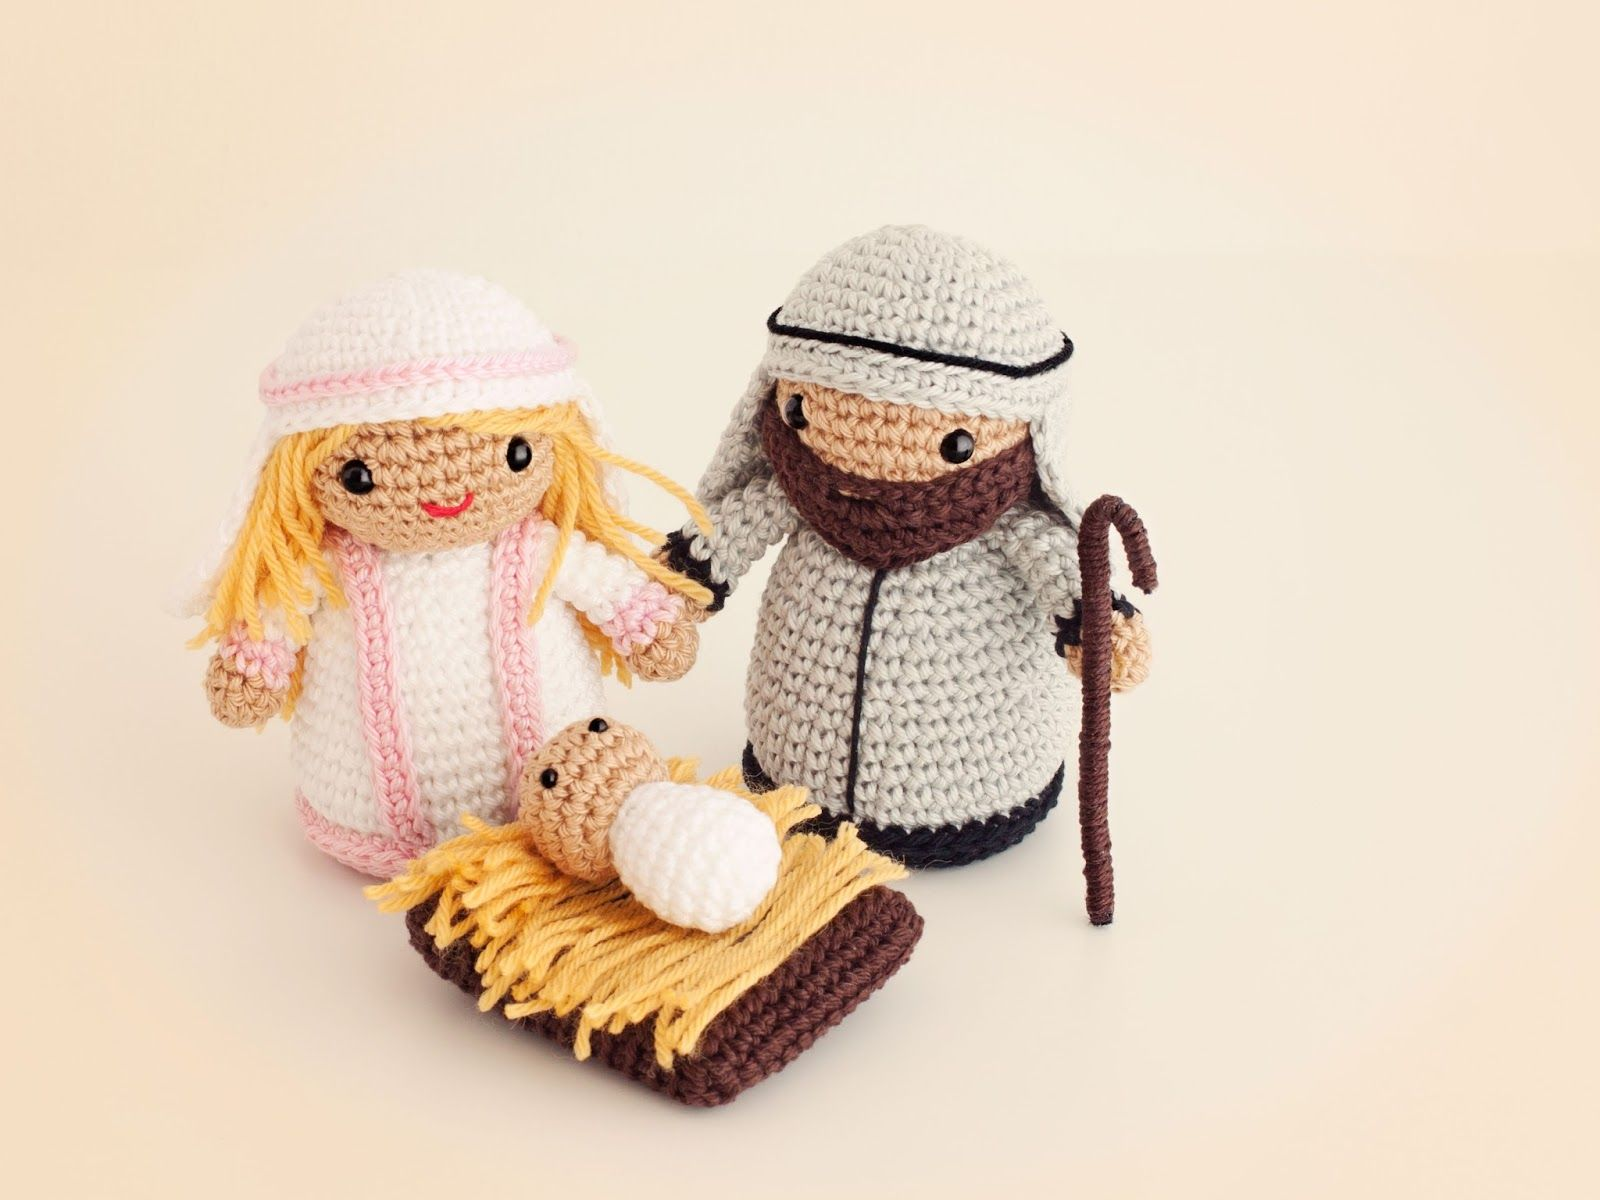 Amigurumi Nativity Scene - FREE Crochet Pattern / Tutorial ...